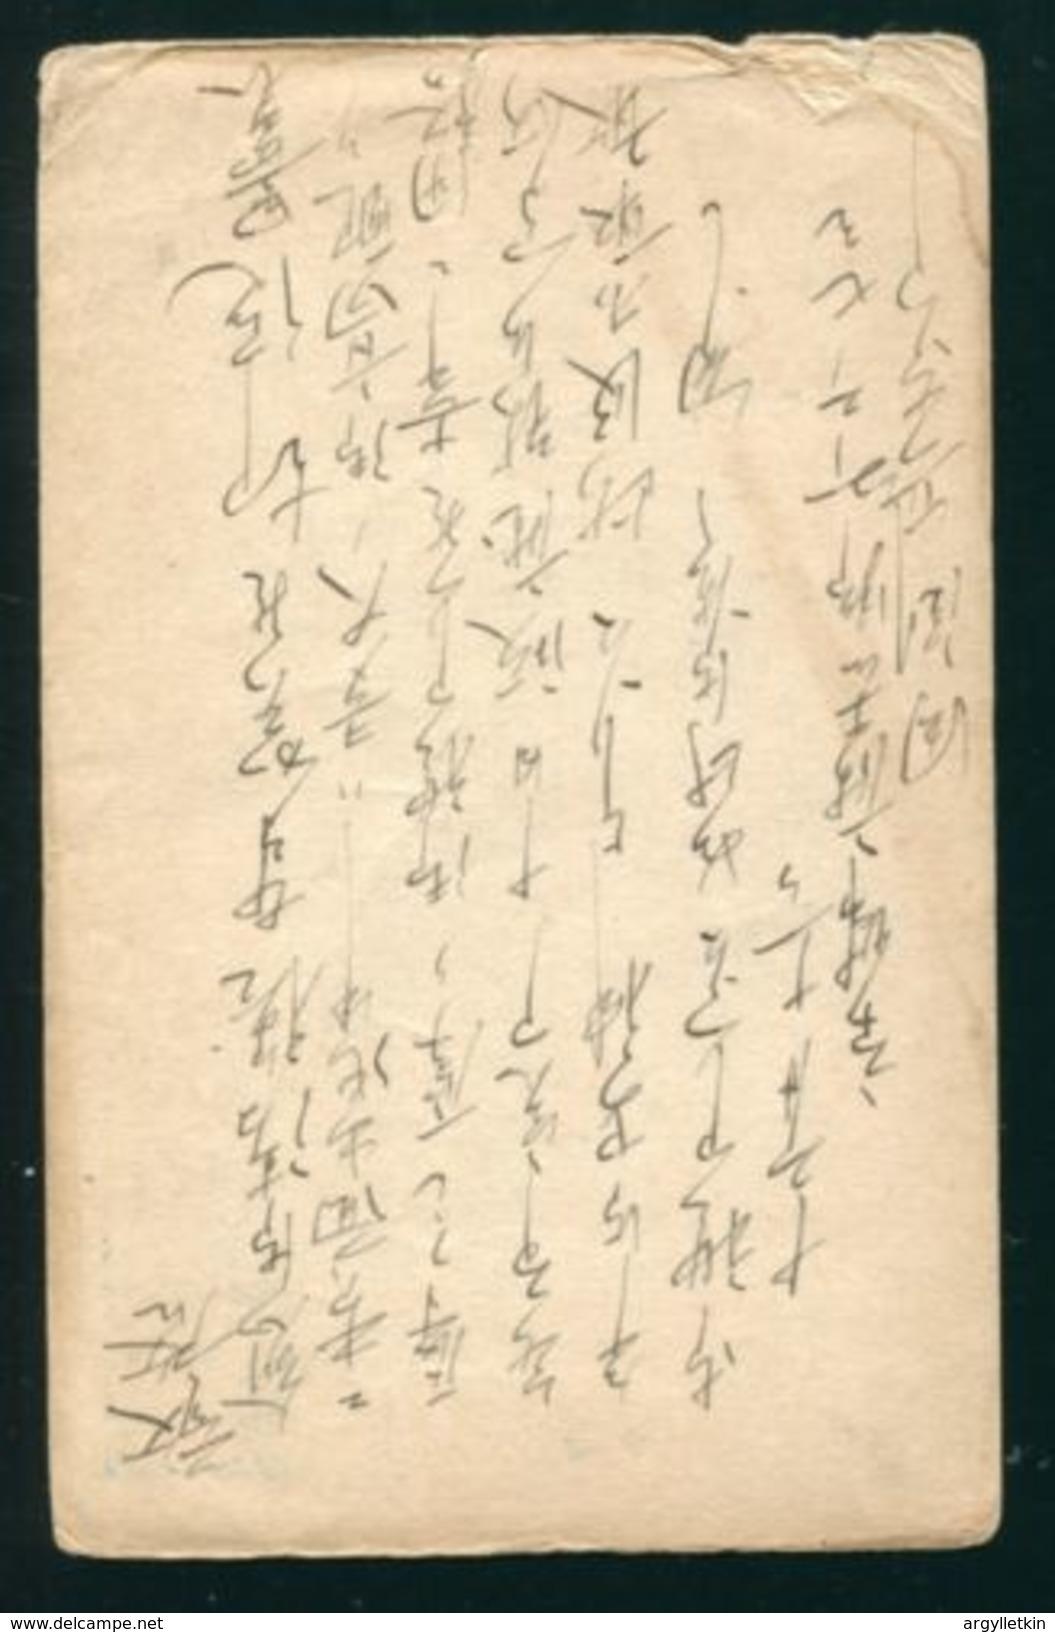 KOREA JAPAN 1925 STATIONERY KYONG SUNG POSTMARK - Korea (...-1945)